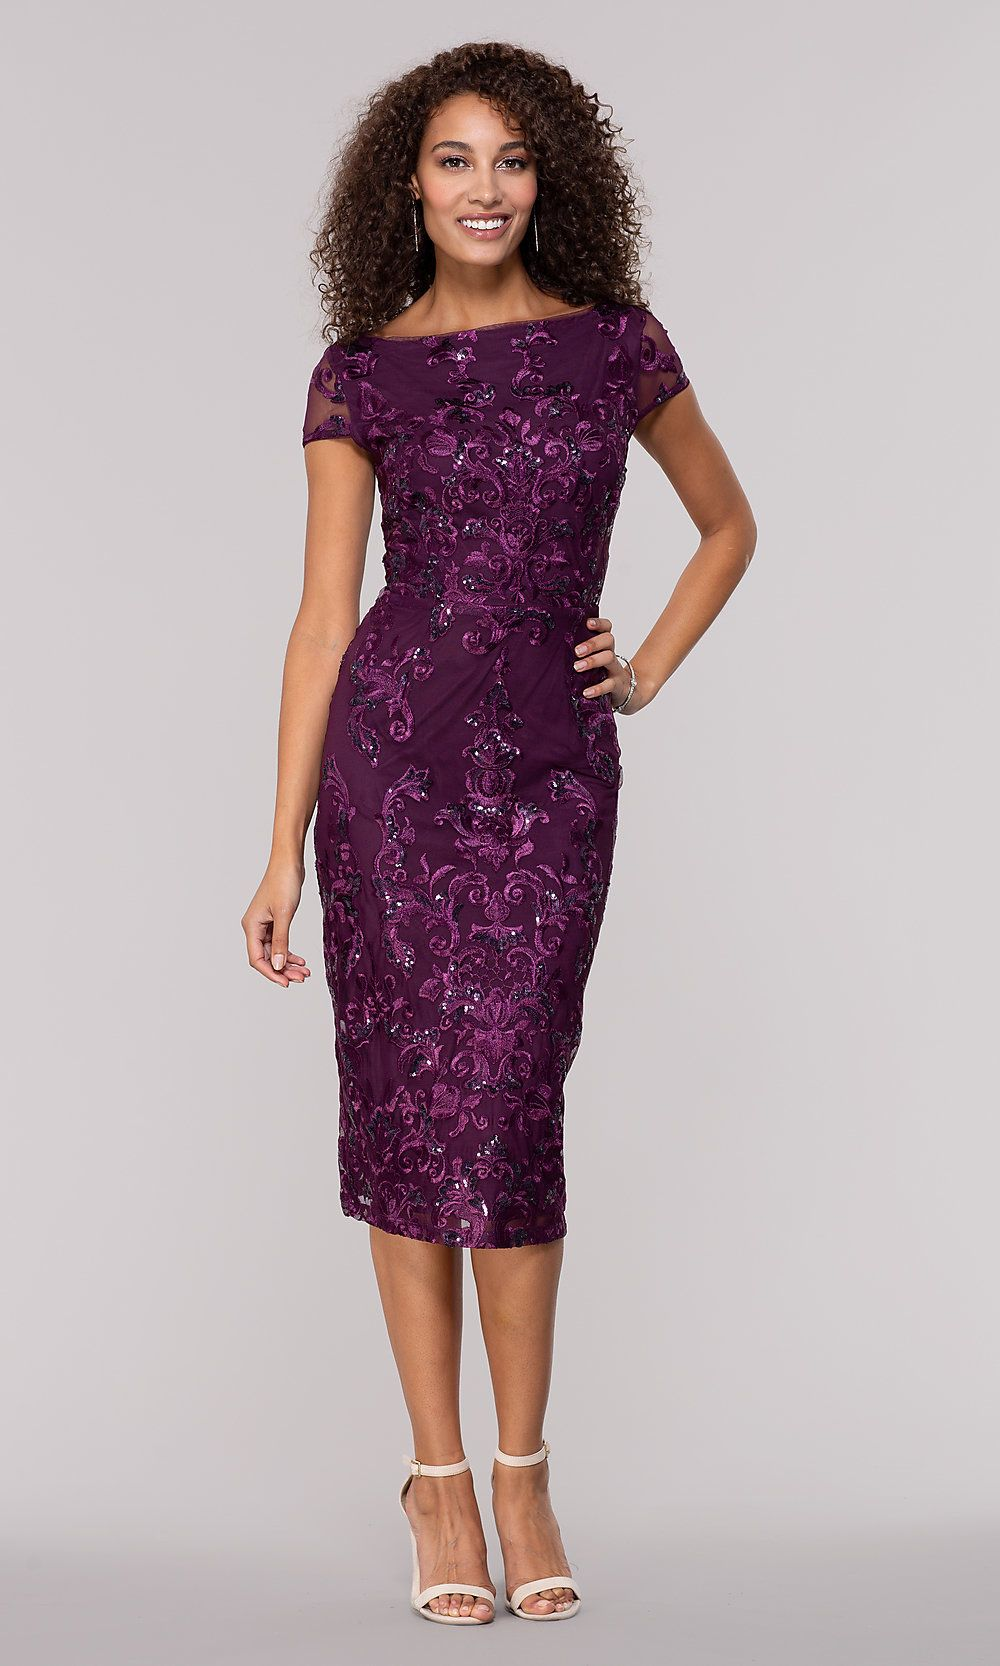 Eggplant Purple Knee Length Wedding Guest Dress Purple Wedding Guest Dresses Wedding Party Dress Guest Wedding Guest Dress